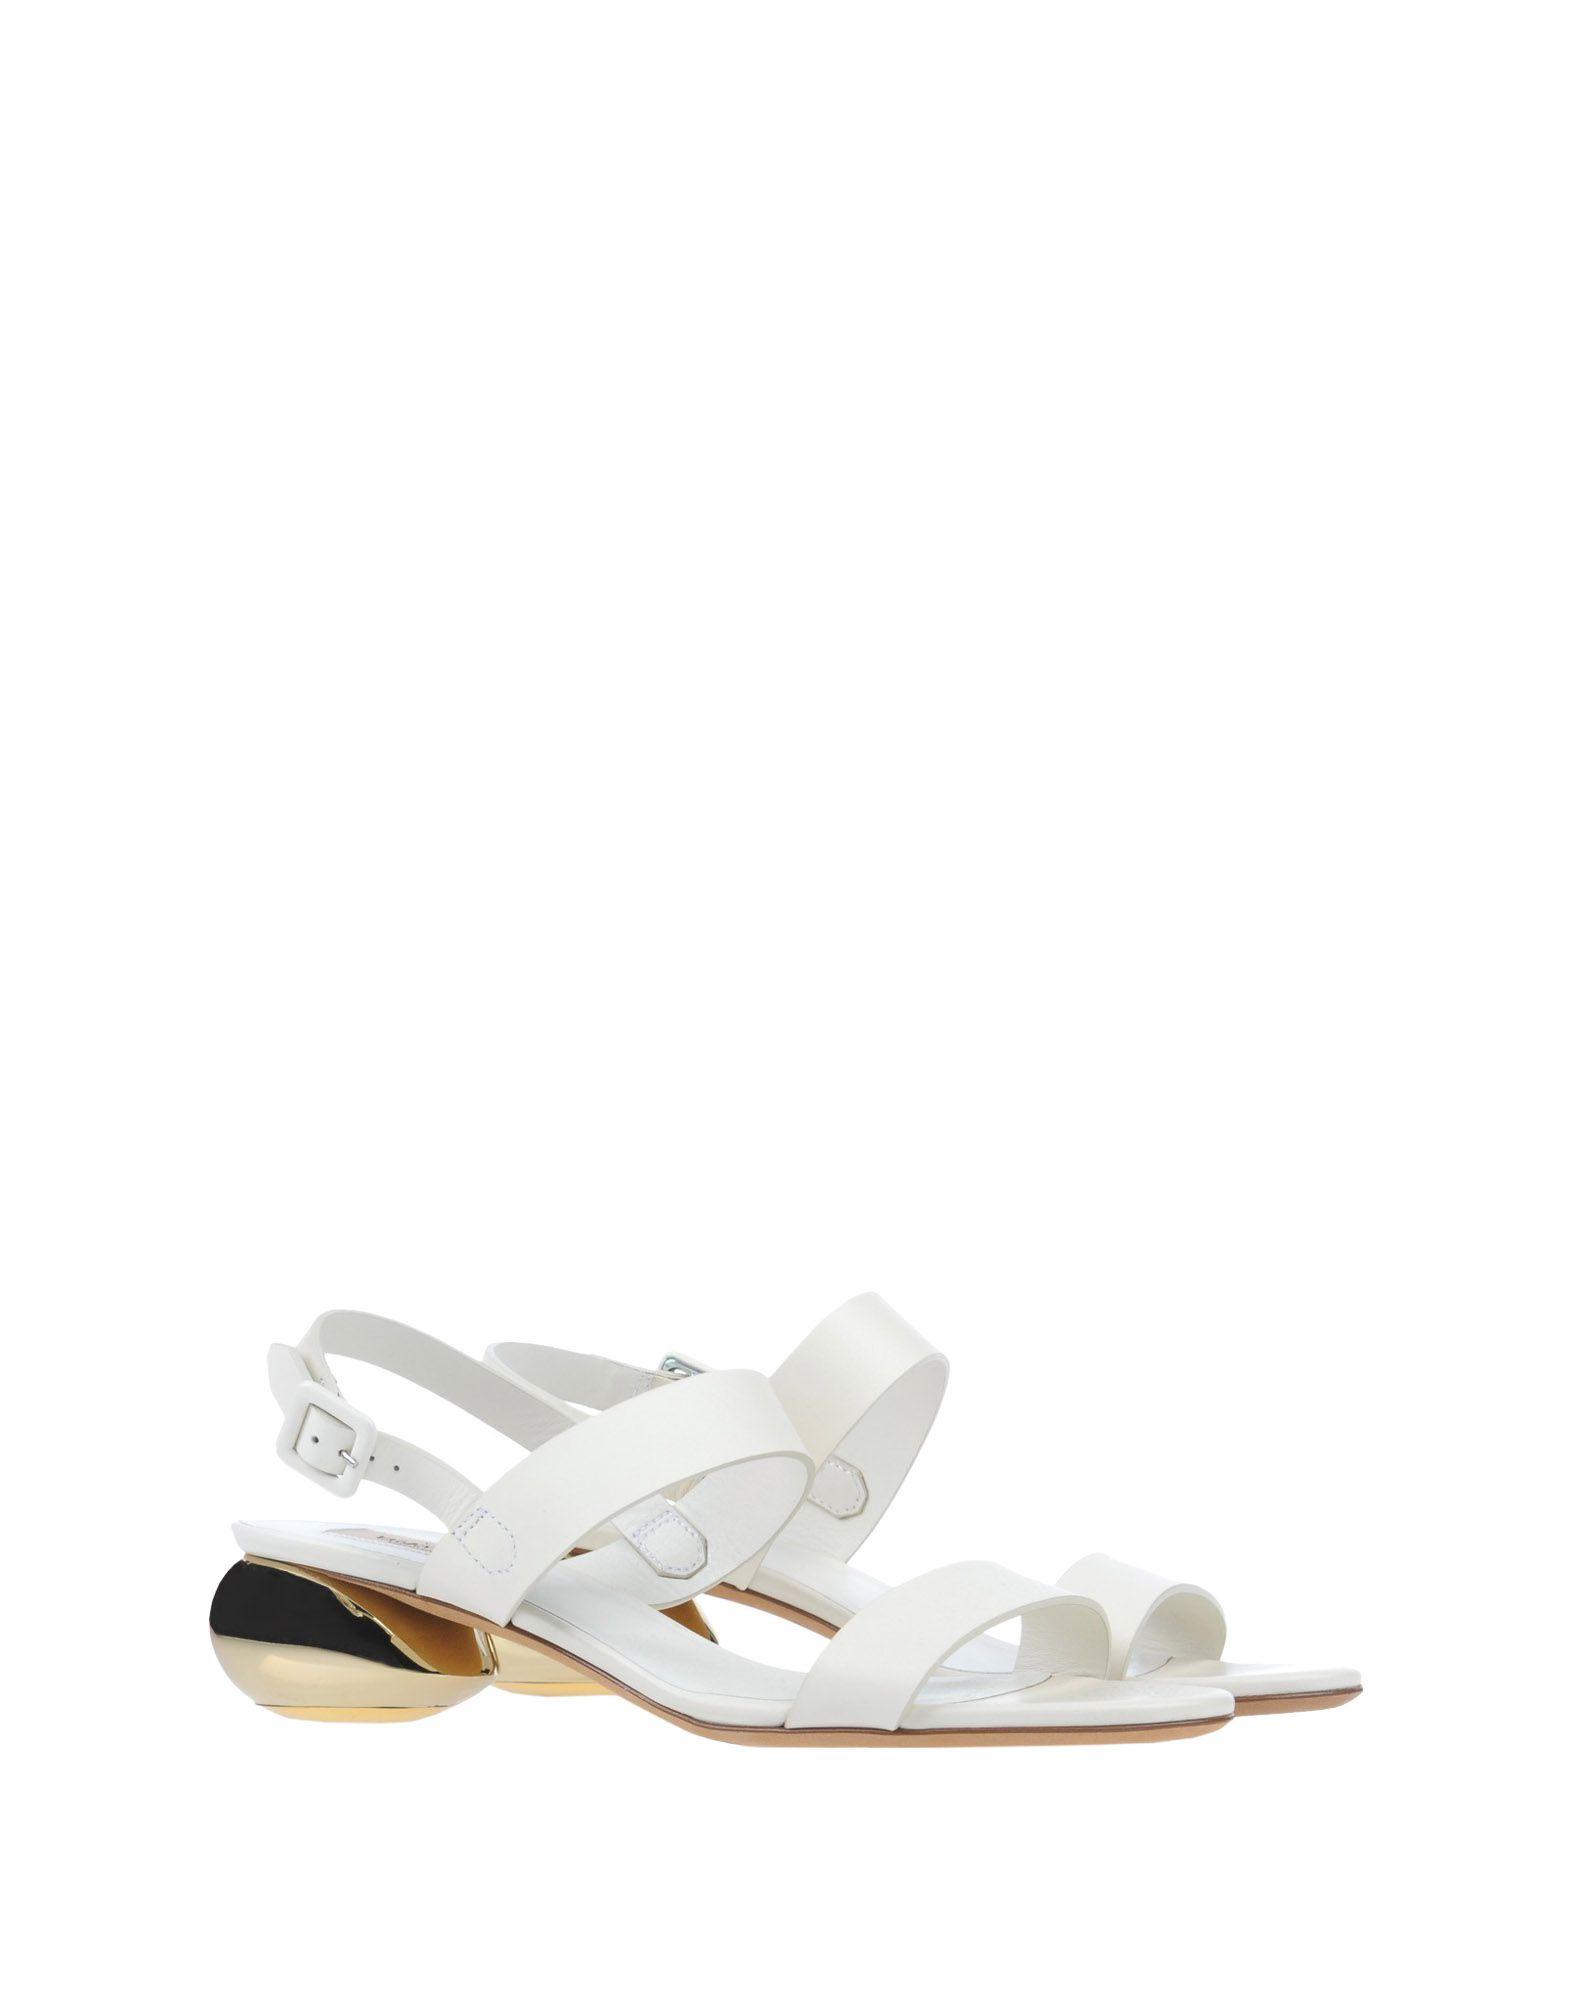 valentino garavani sandales sandales sandales - femmes valentino garavani sandales en ligne sur canada - 11308693le db041d